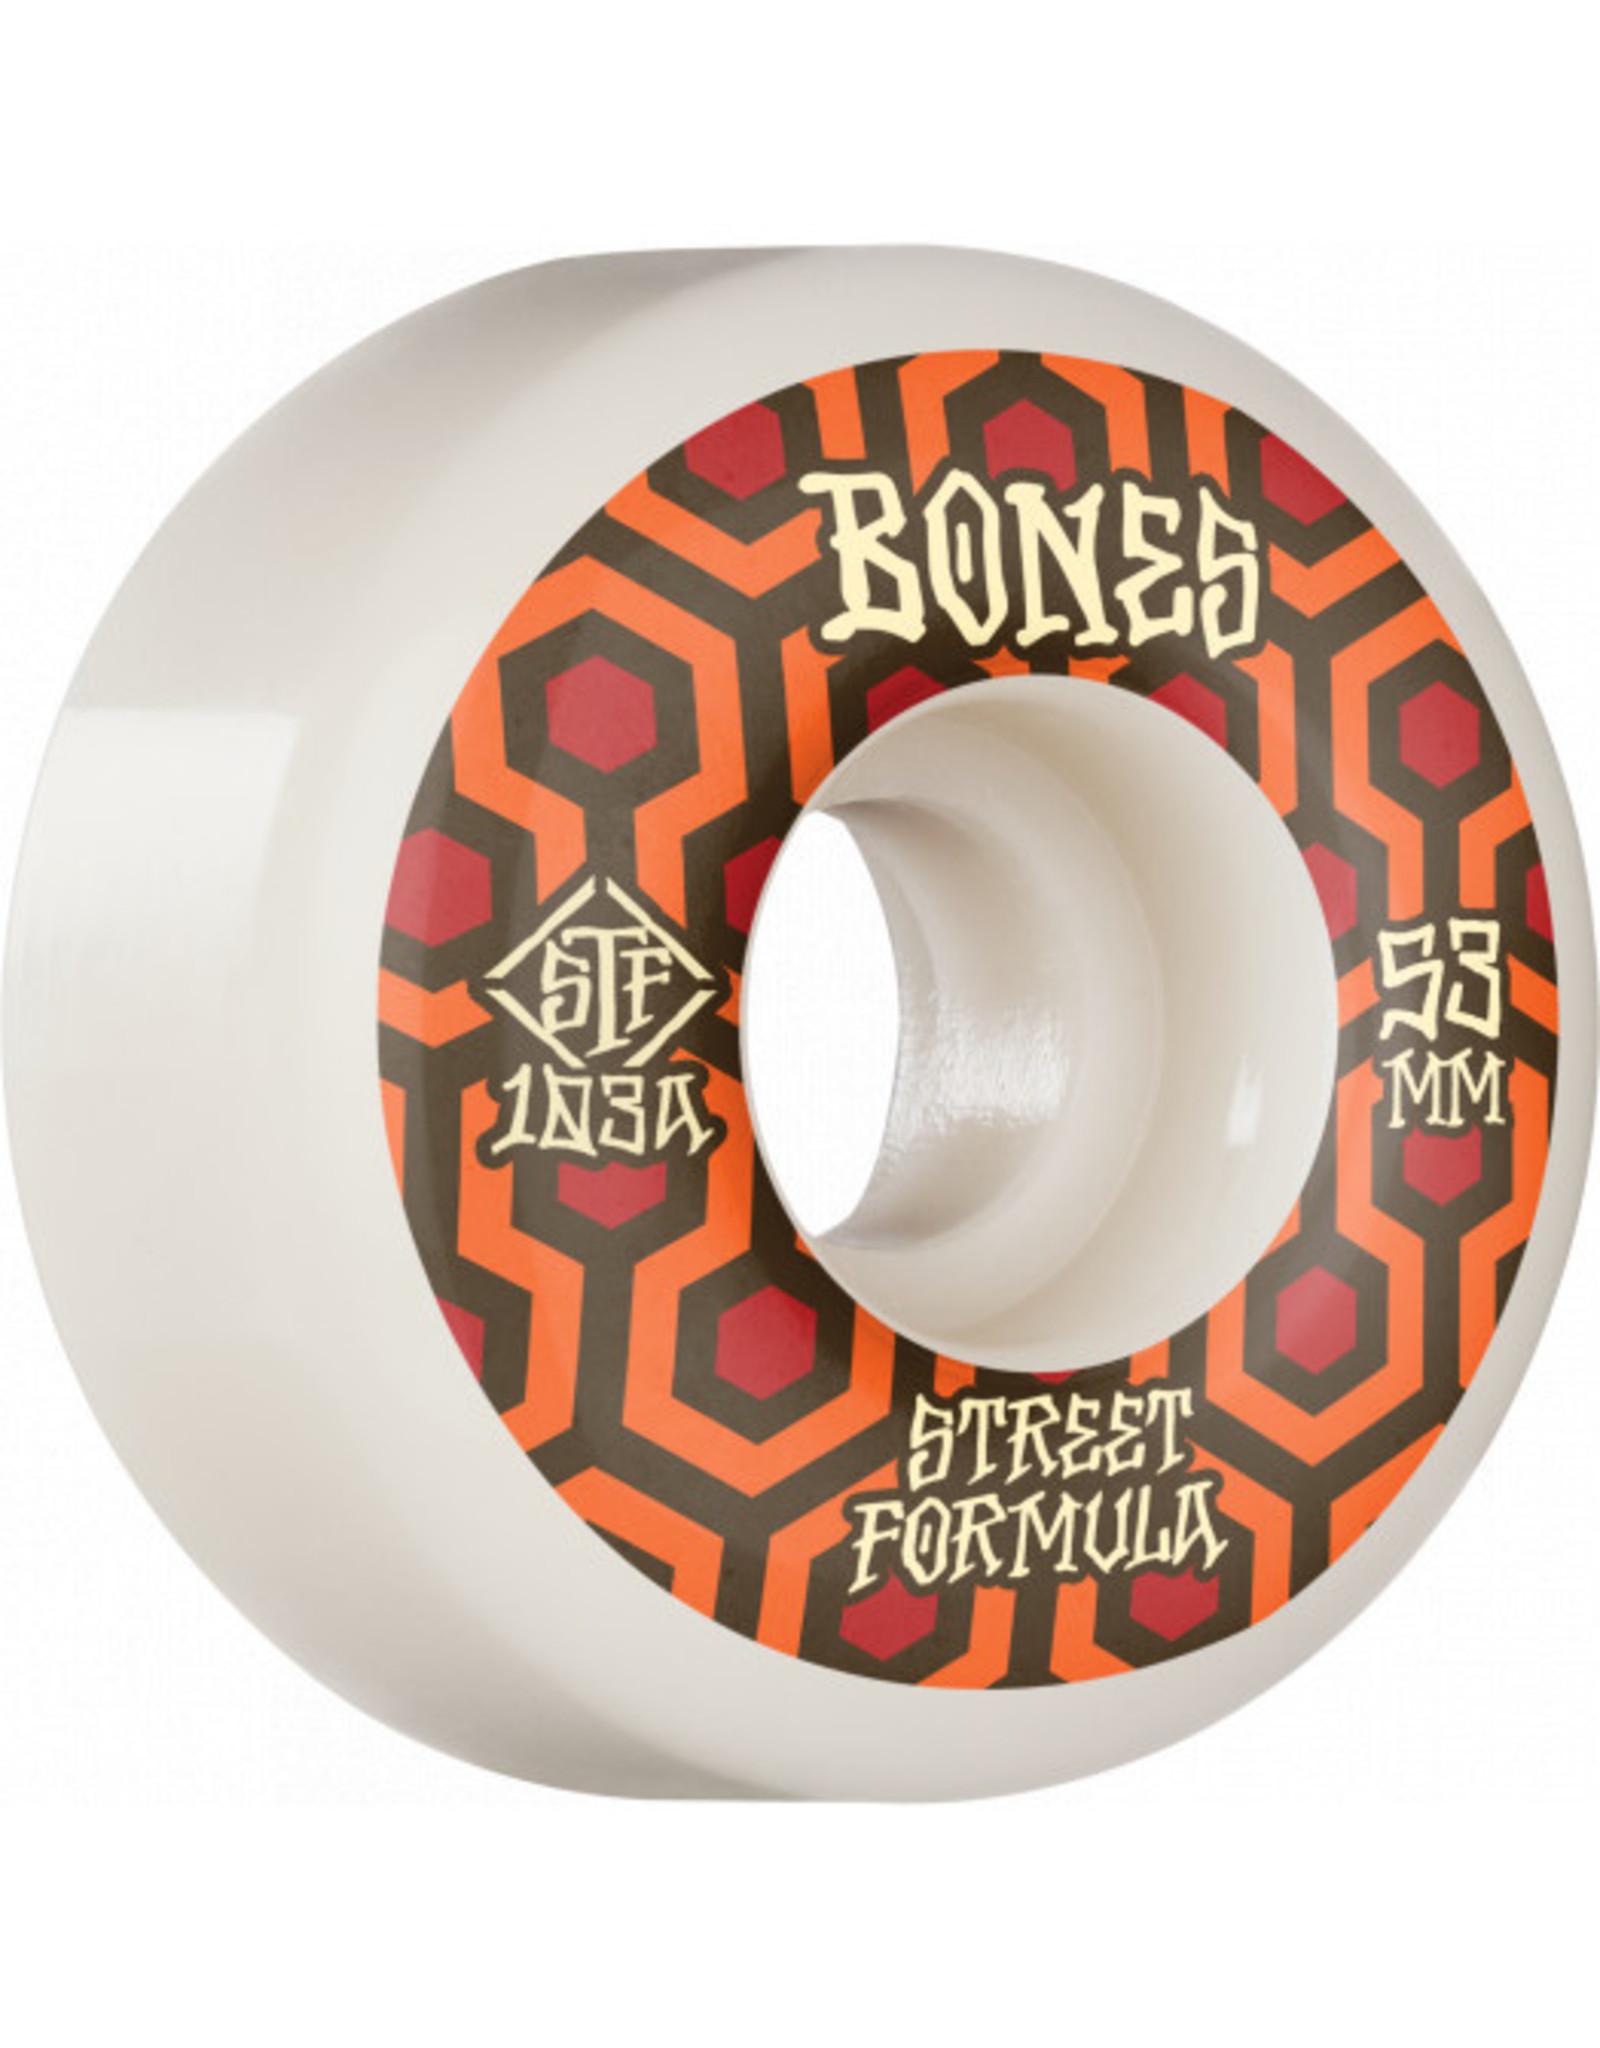 BONES BONES - STF RETRO - V1 - 53 - 103A